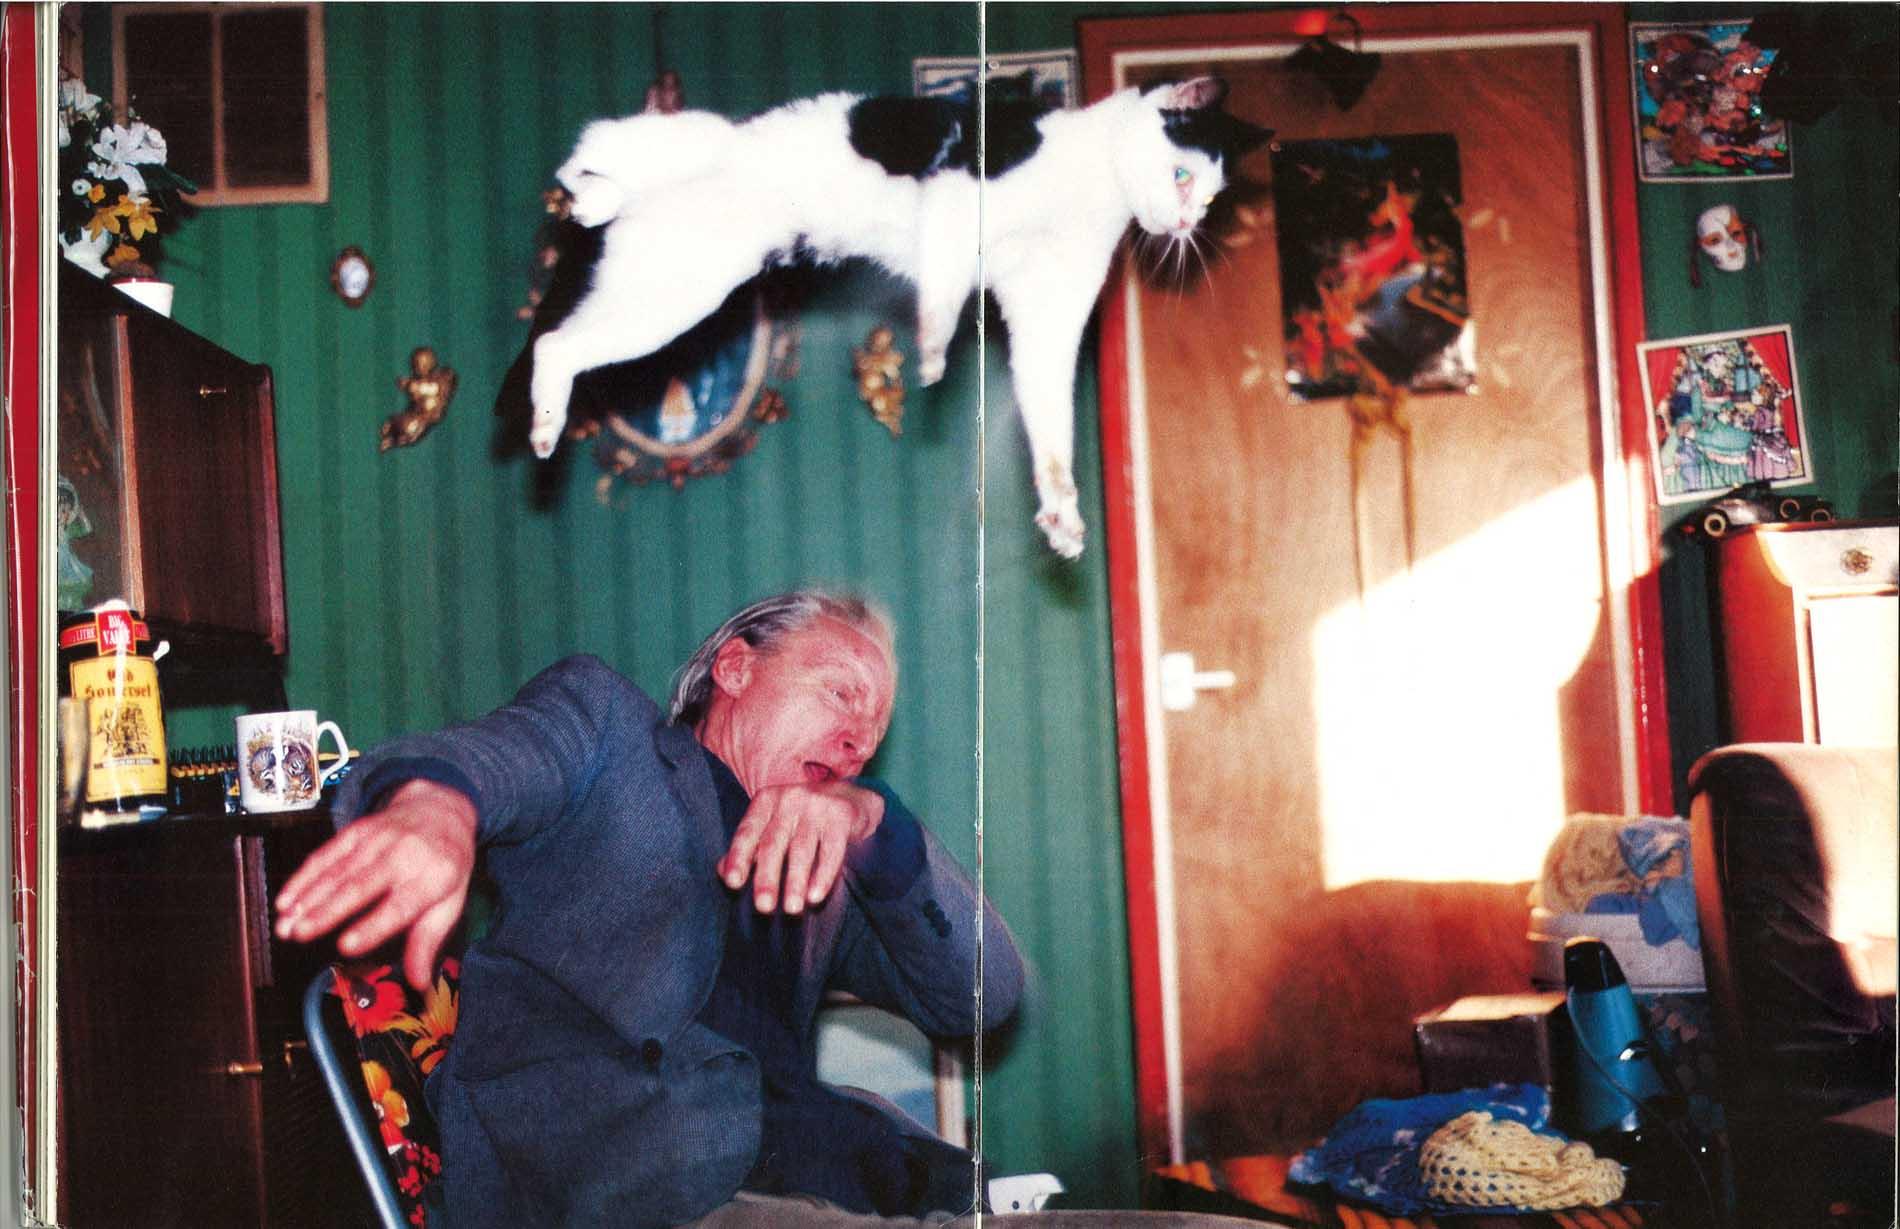 Reinterpreting Unconventional Family Photographs